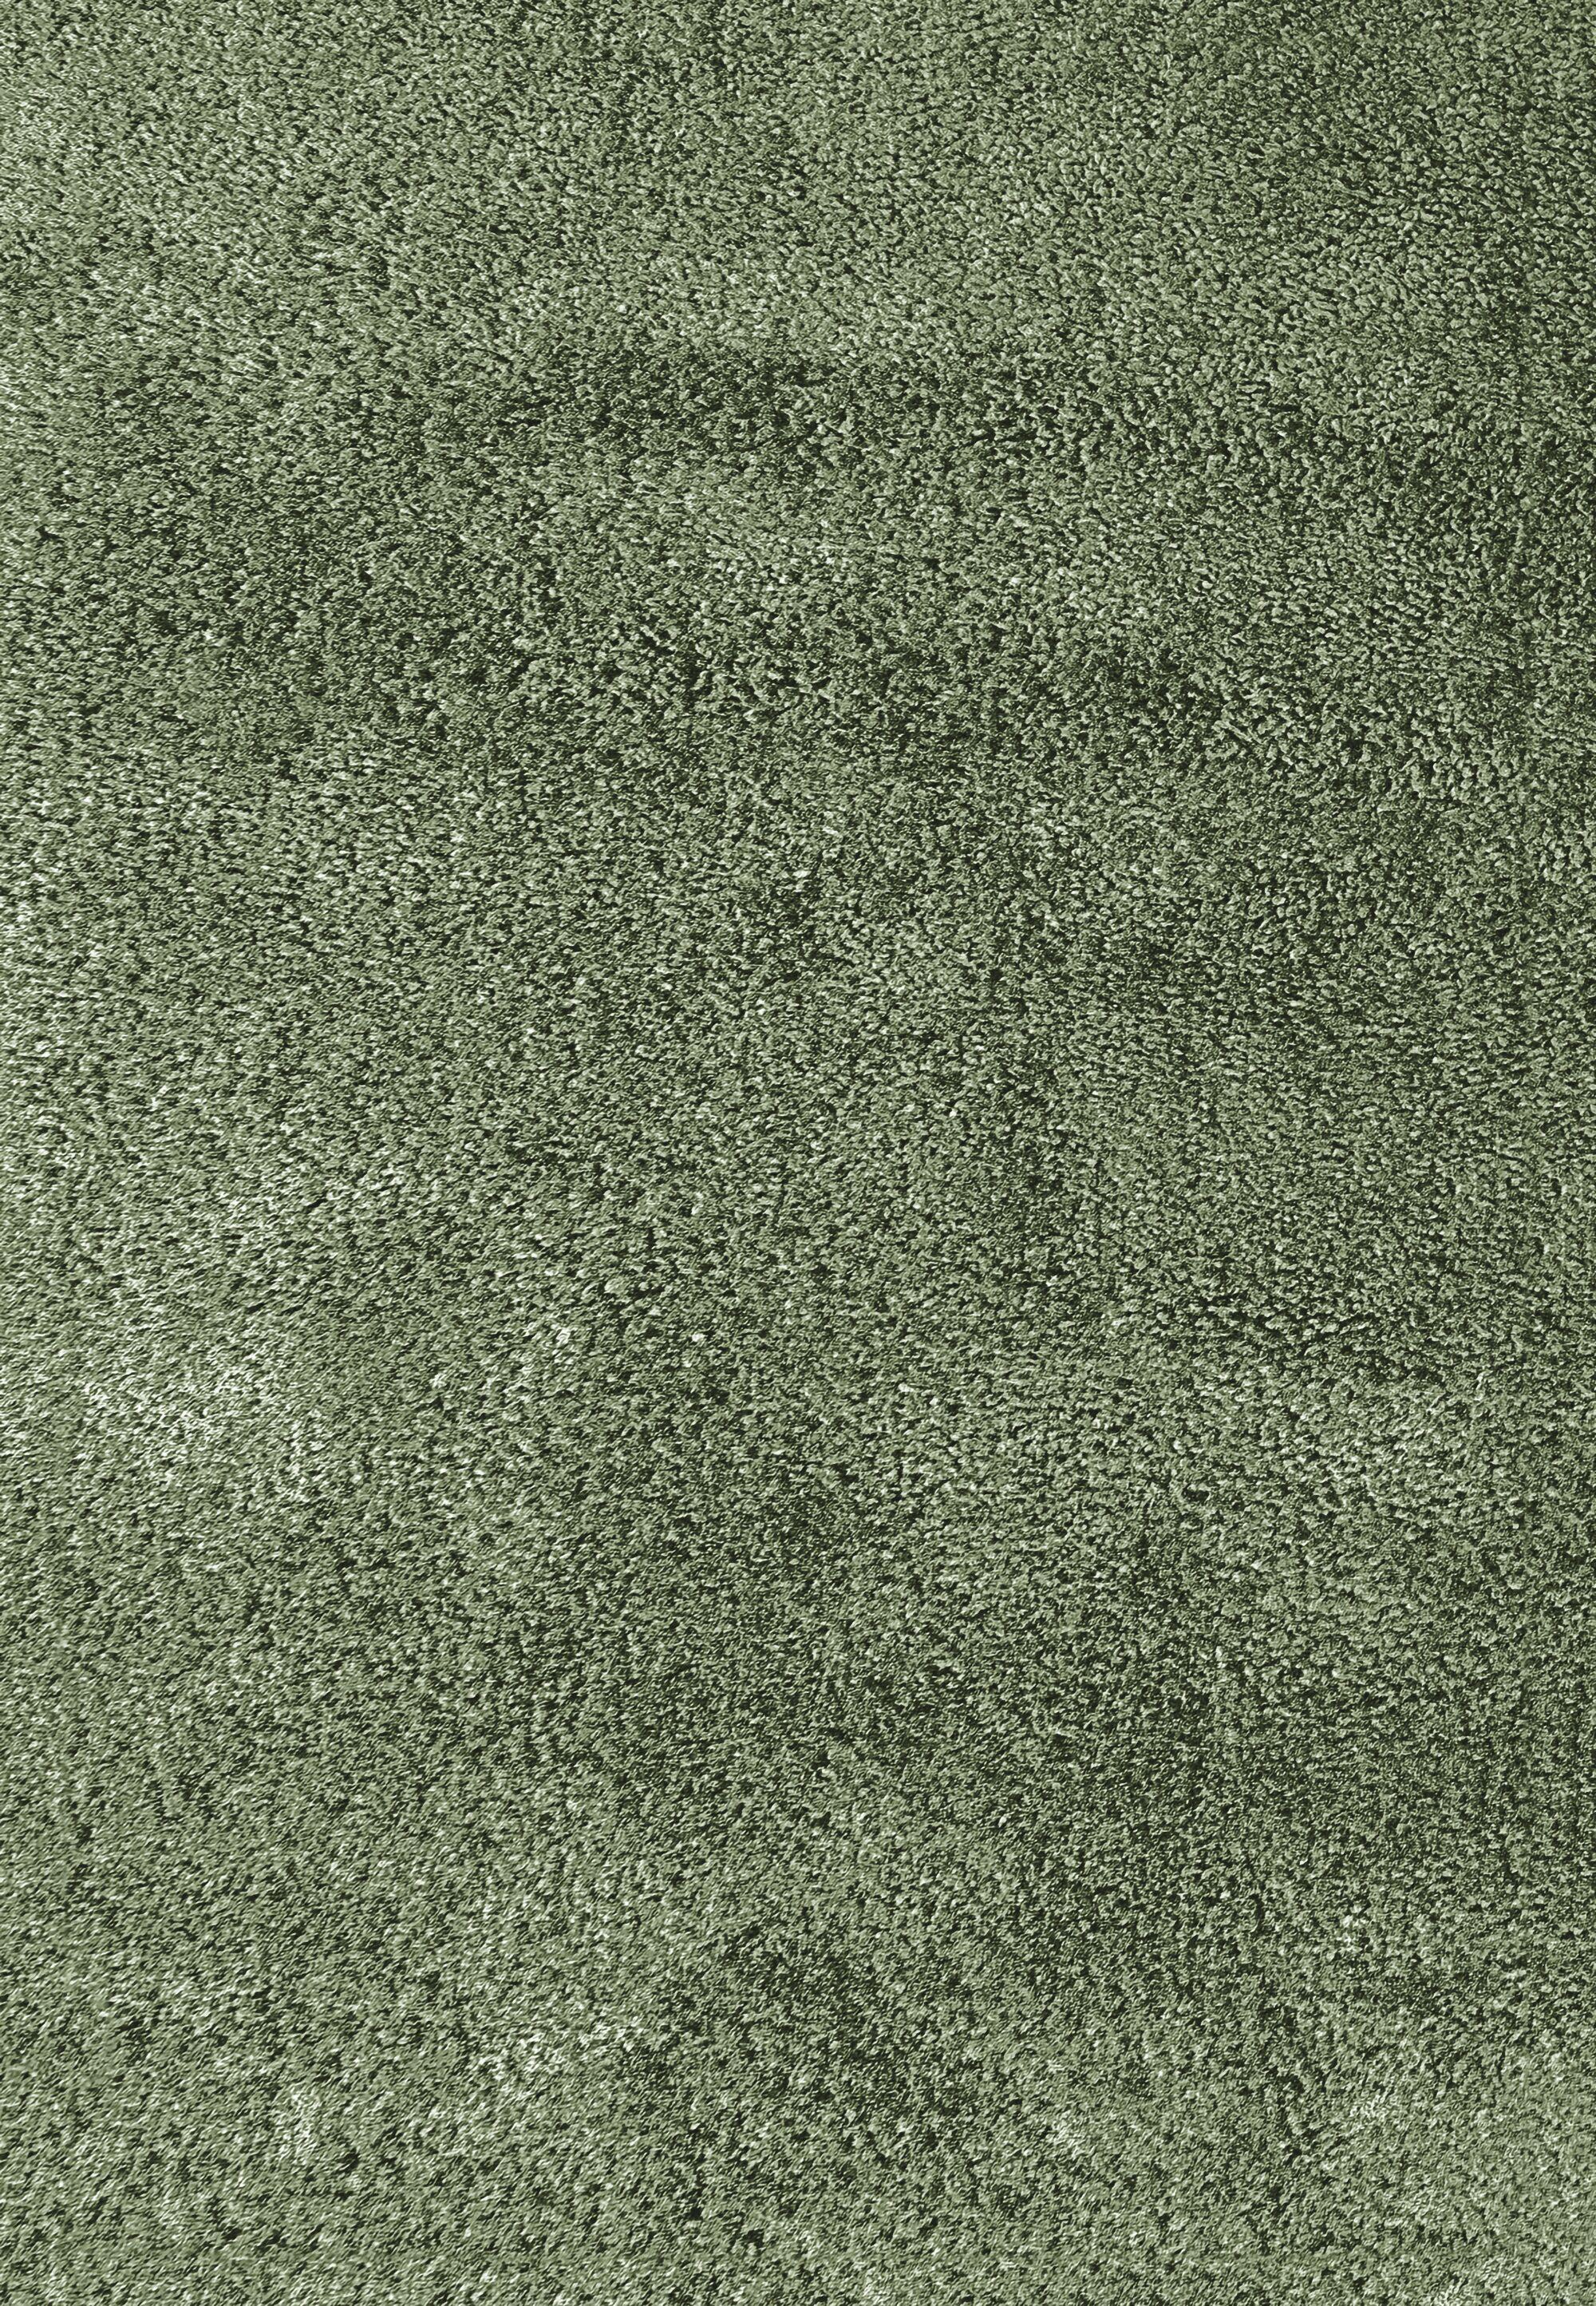 Luxury Shag Hand Tufted Light Green Area Rug Rug Size: Rectangle 8' x 10'